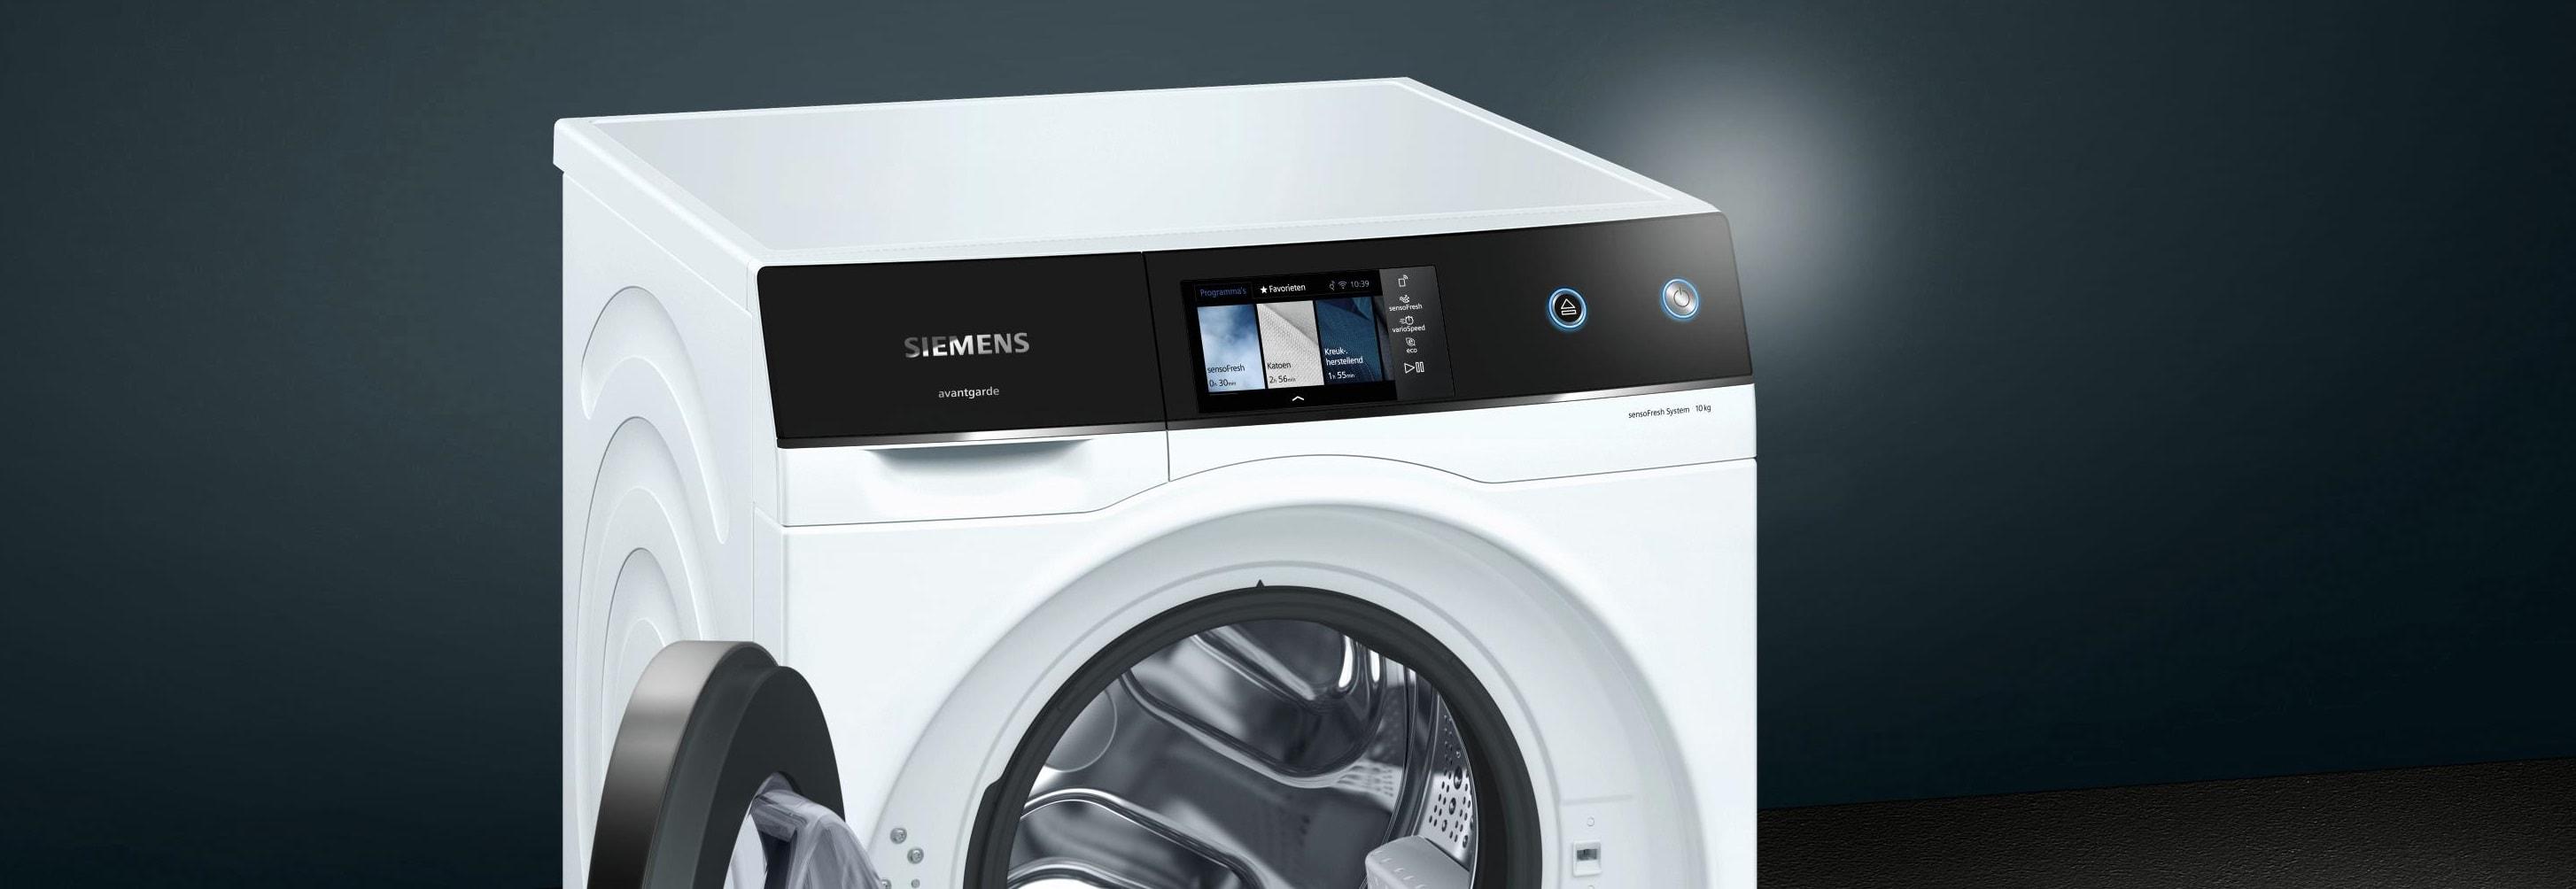 Bekend Siemens wasmachine storing F21 - Reparatievakman.nl FM22